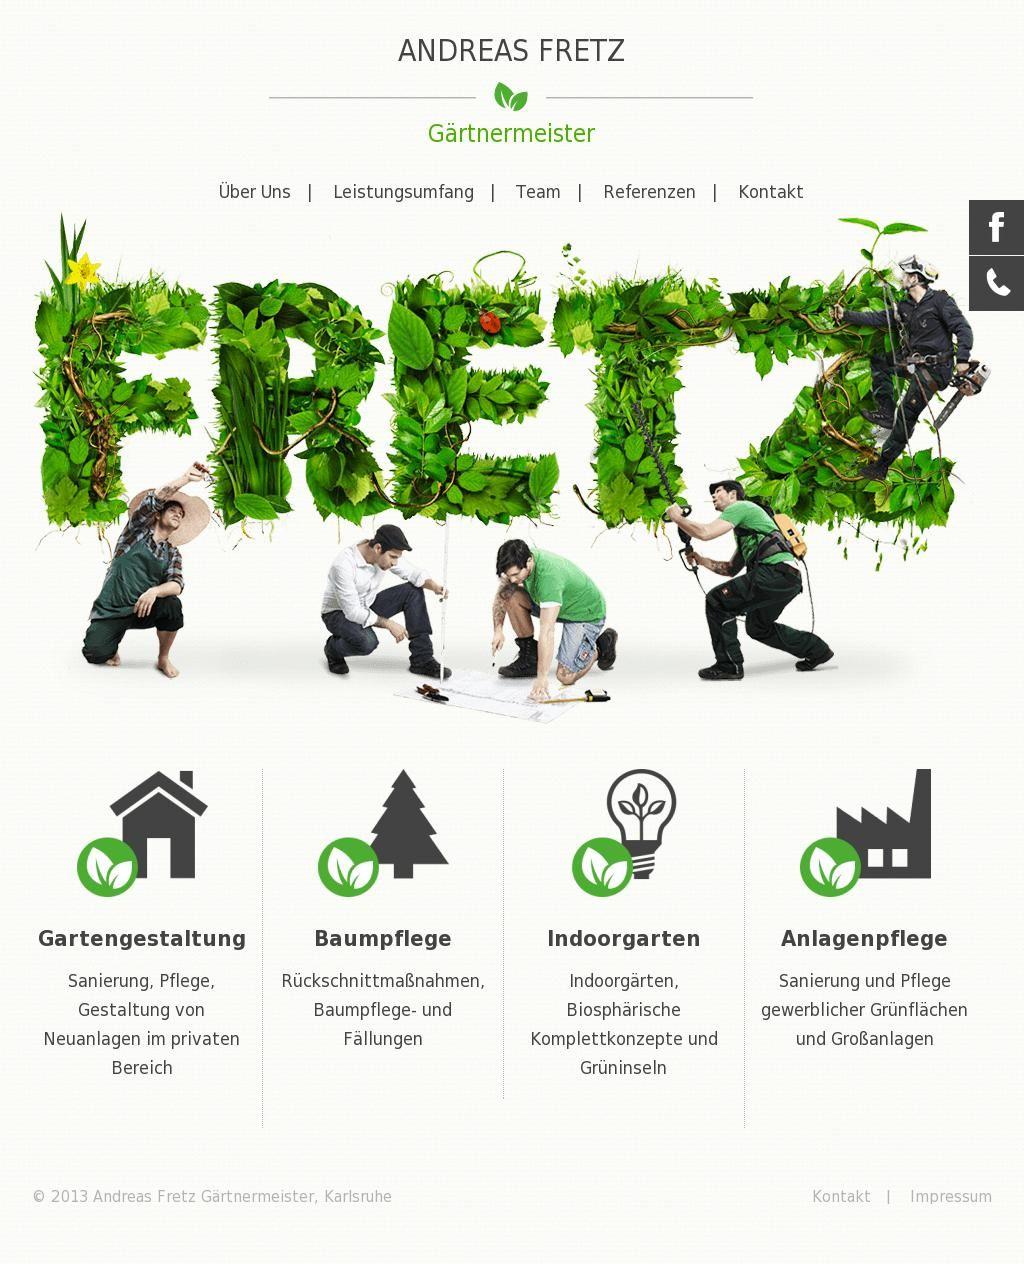 Gartengestaltung Karlsruhe gärtner gartenbau landschaftsbau karlsruhe andreas fretz web